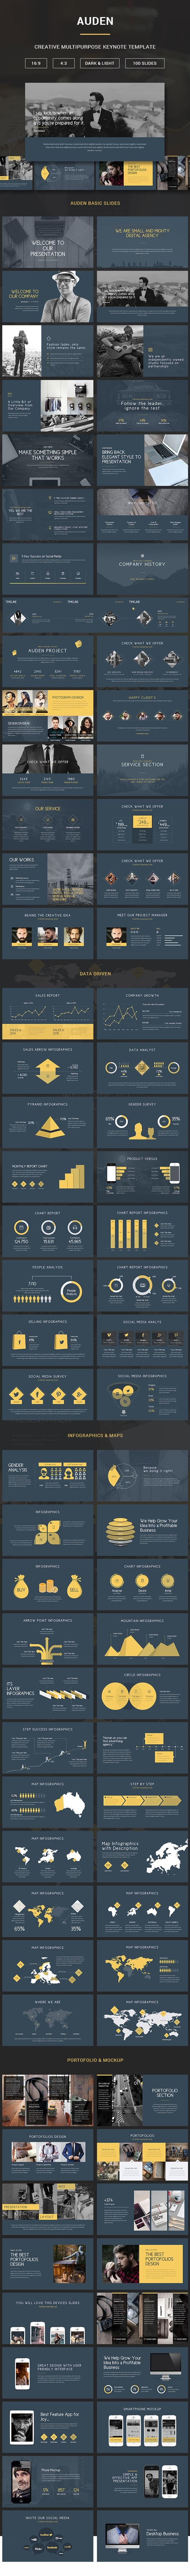 Auden - Creative Keynote Pitch Deck - Creative Keynote Templates